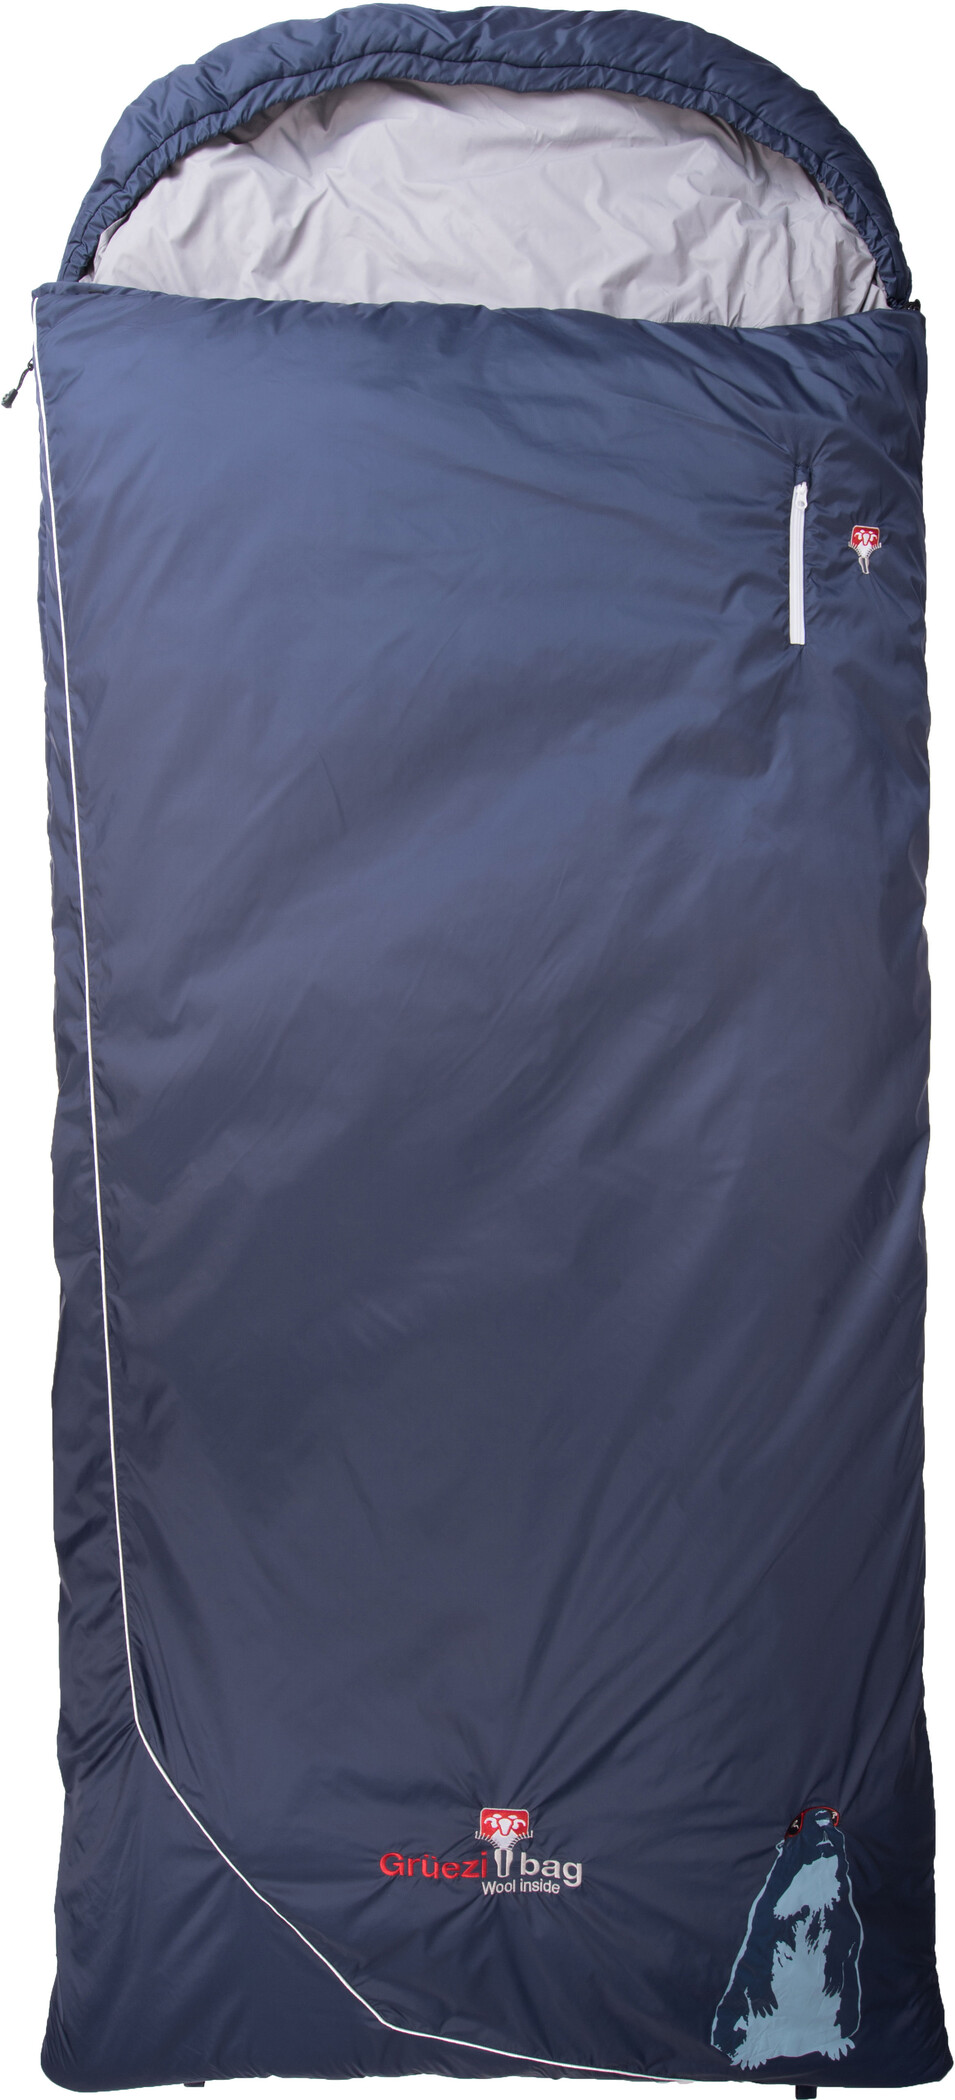 Grüezi-Bag Biopod Wool Murmeltier Comfort Sovepose XXL, currant, night blue | Transport og opbevaring > Tilbehør